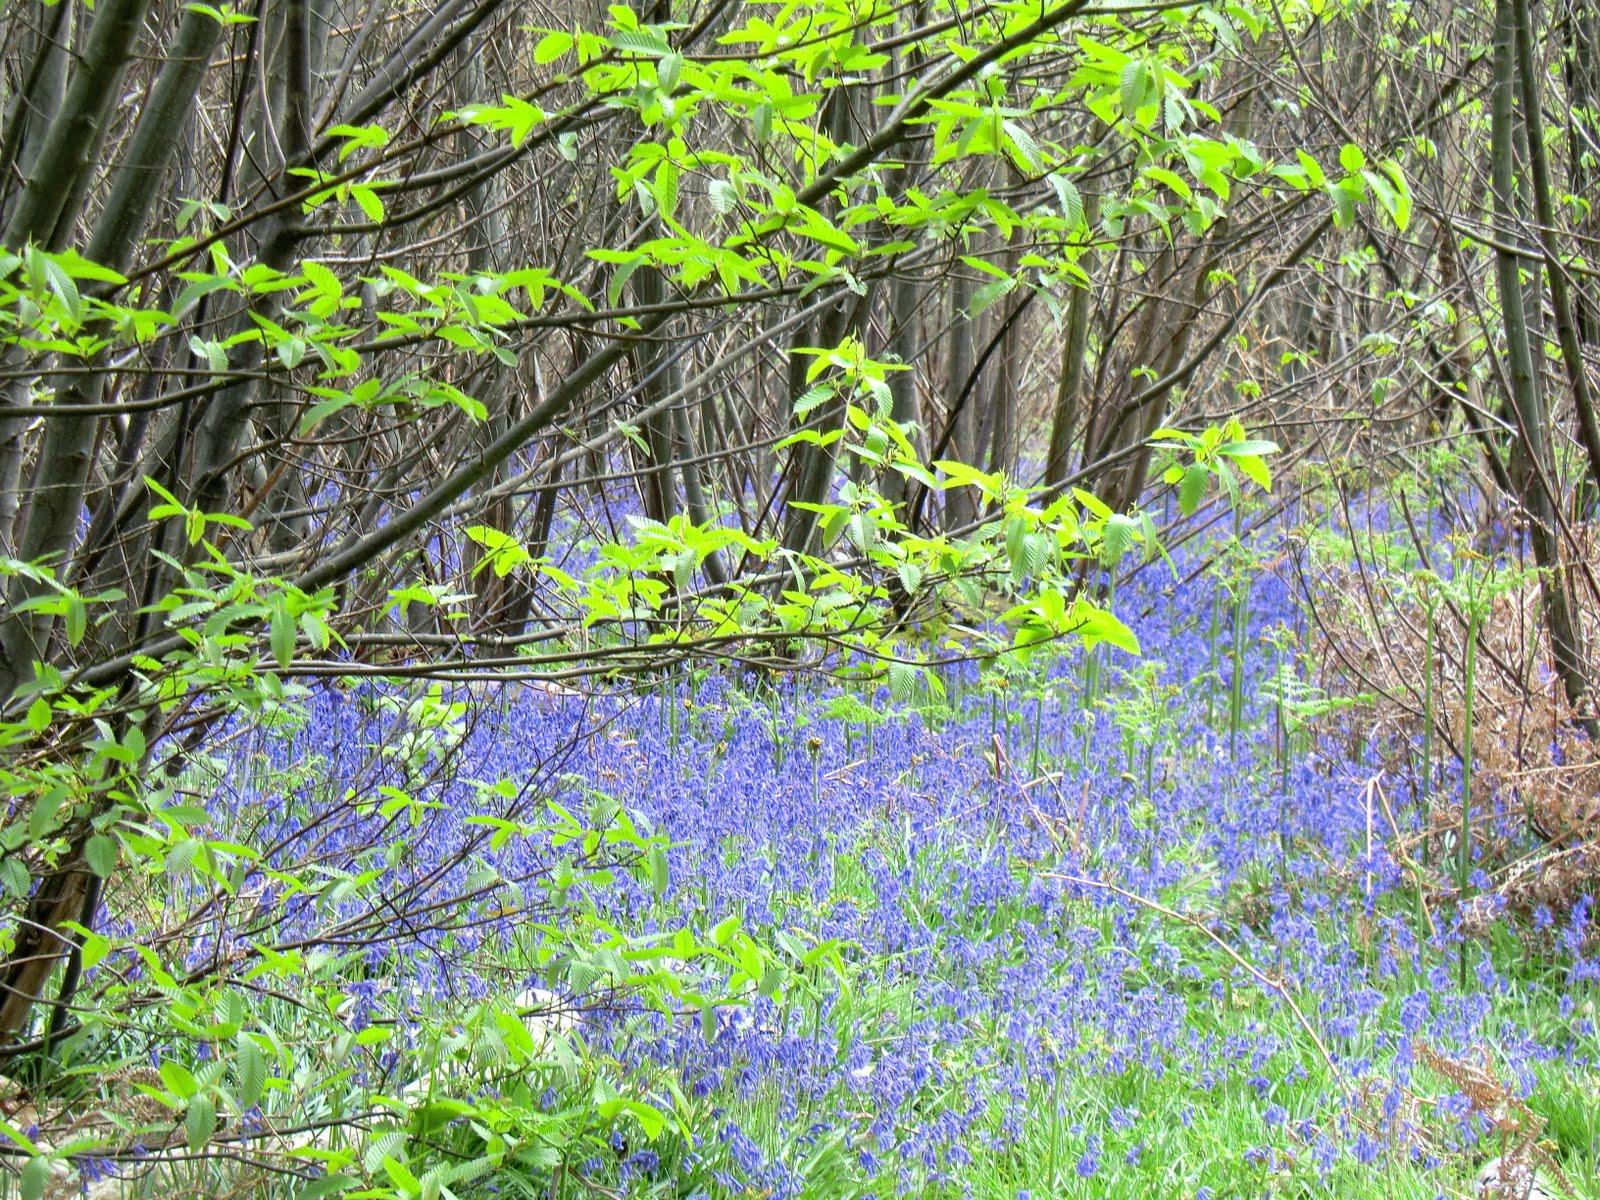 CIMG6434 Bluebells, Wapsbourne Wood